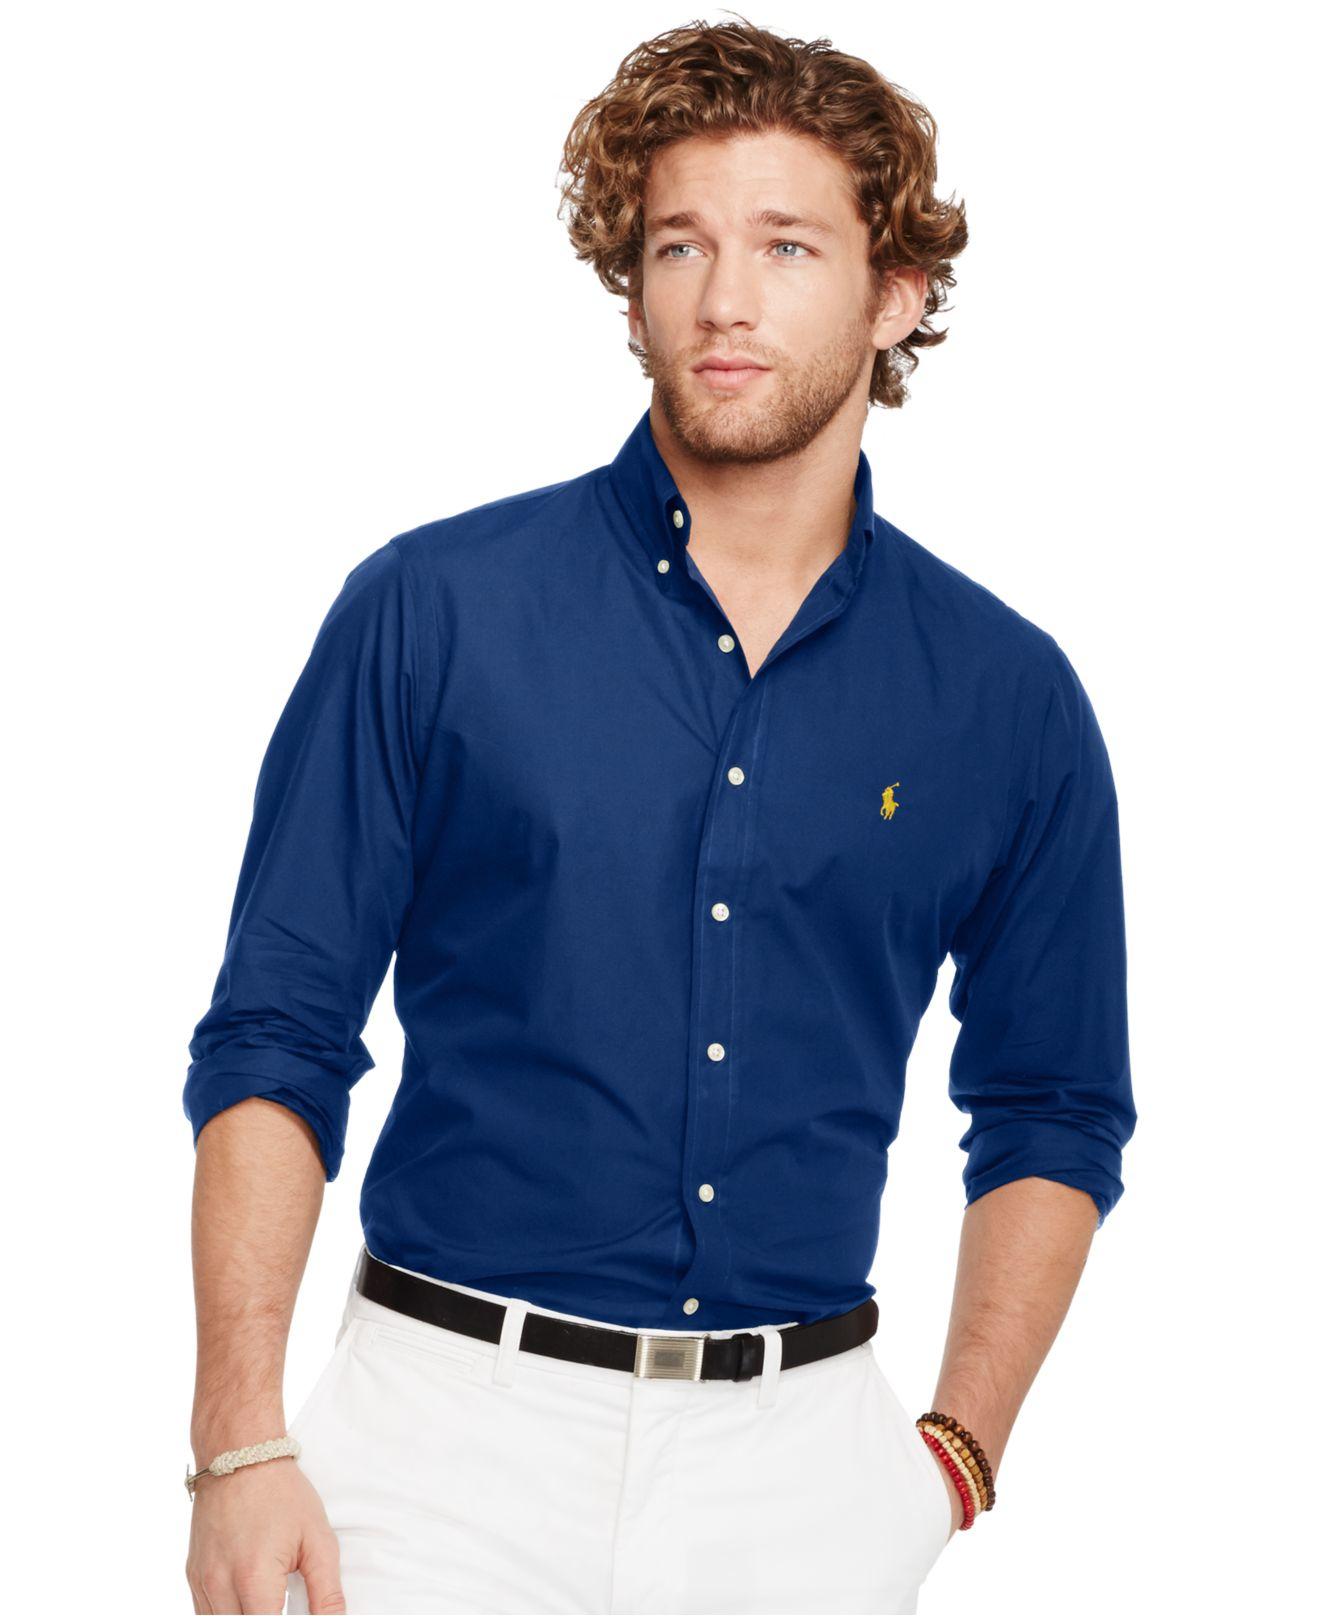 f8db16ca8139b7 Polo Ralph Lauren Men's Slim-fit Poplin Shirt in Blue for Men - Lyst